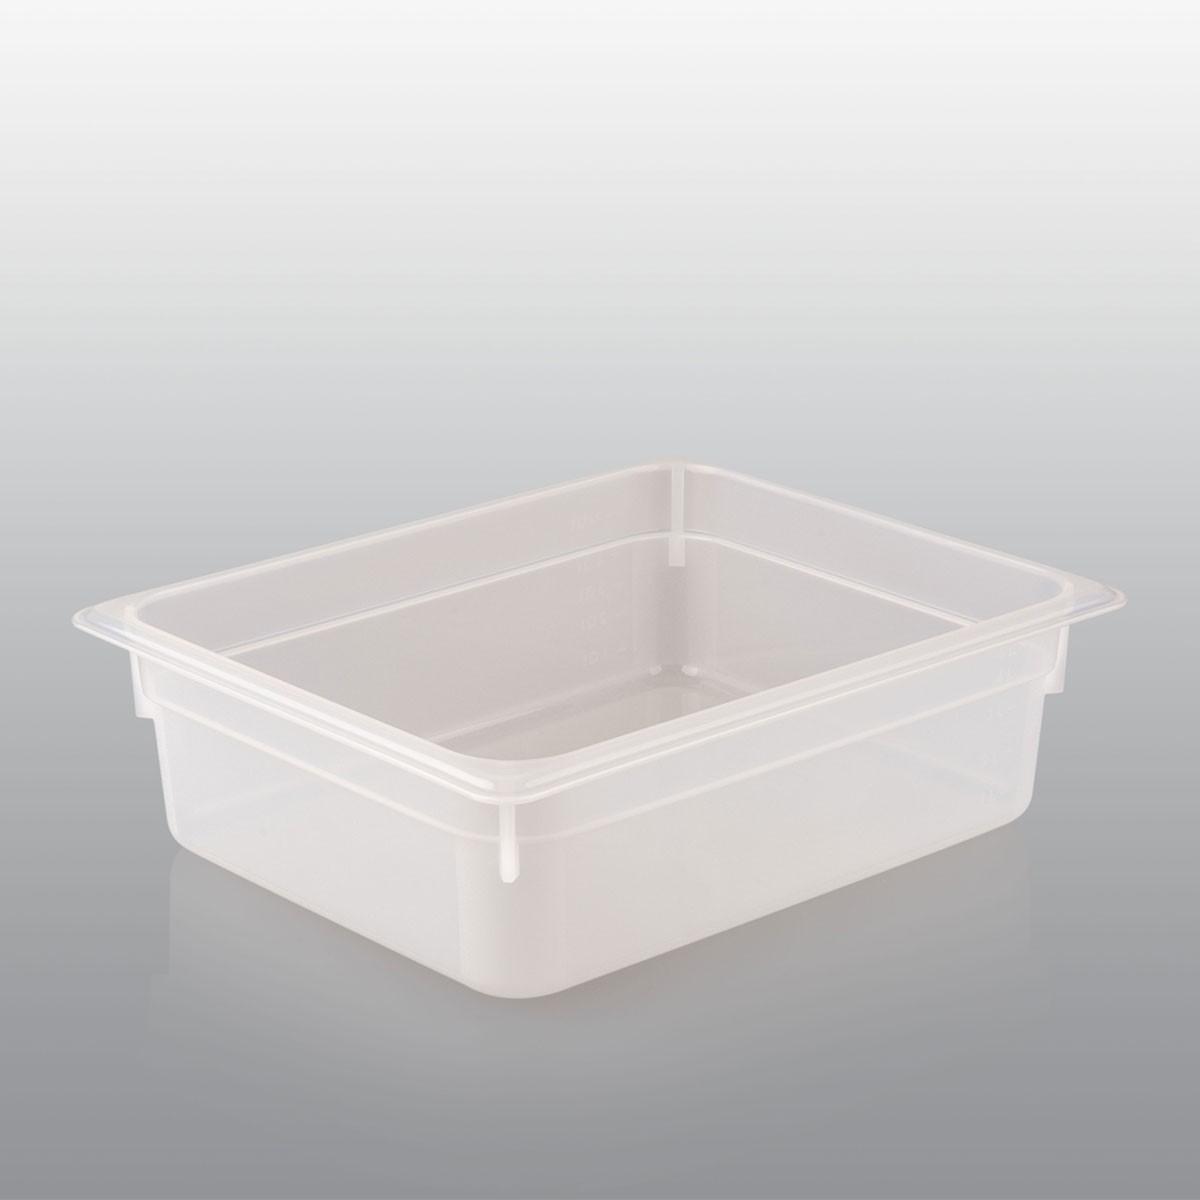 GN Behälter GN 1/2 aus Polypropylen (Tiefe: 100mm) 6,5 L Saro